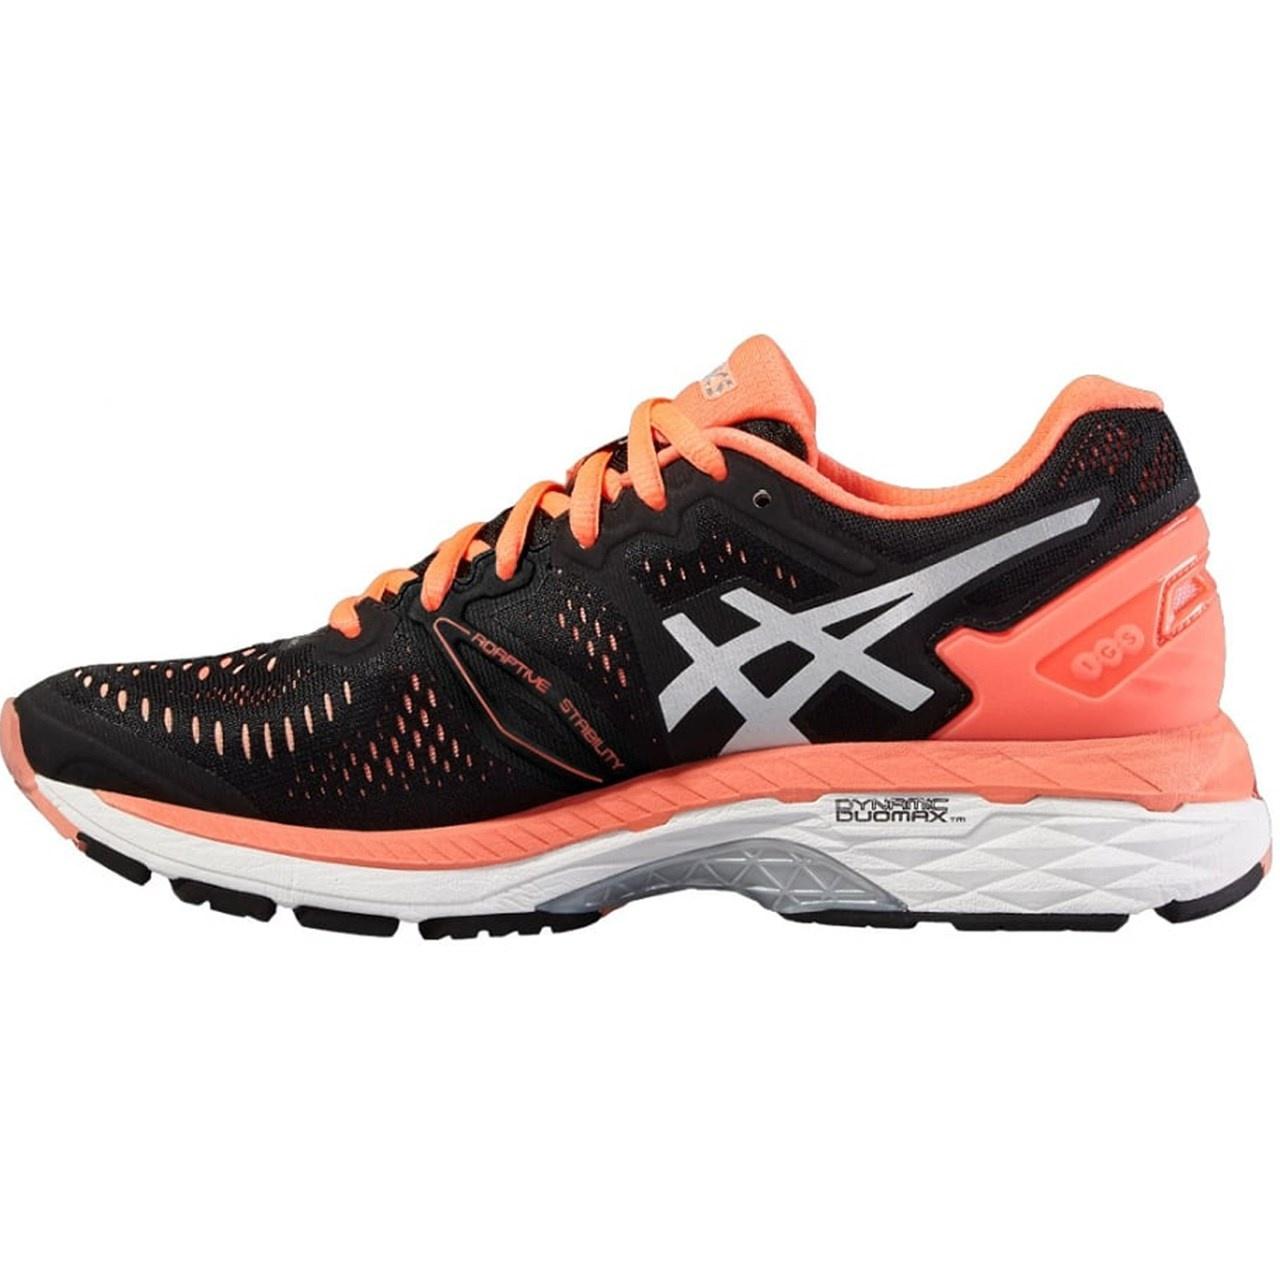 کفش مخصوص دویدن زنانه اسیکس مدل  kayana23 F 350716